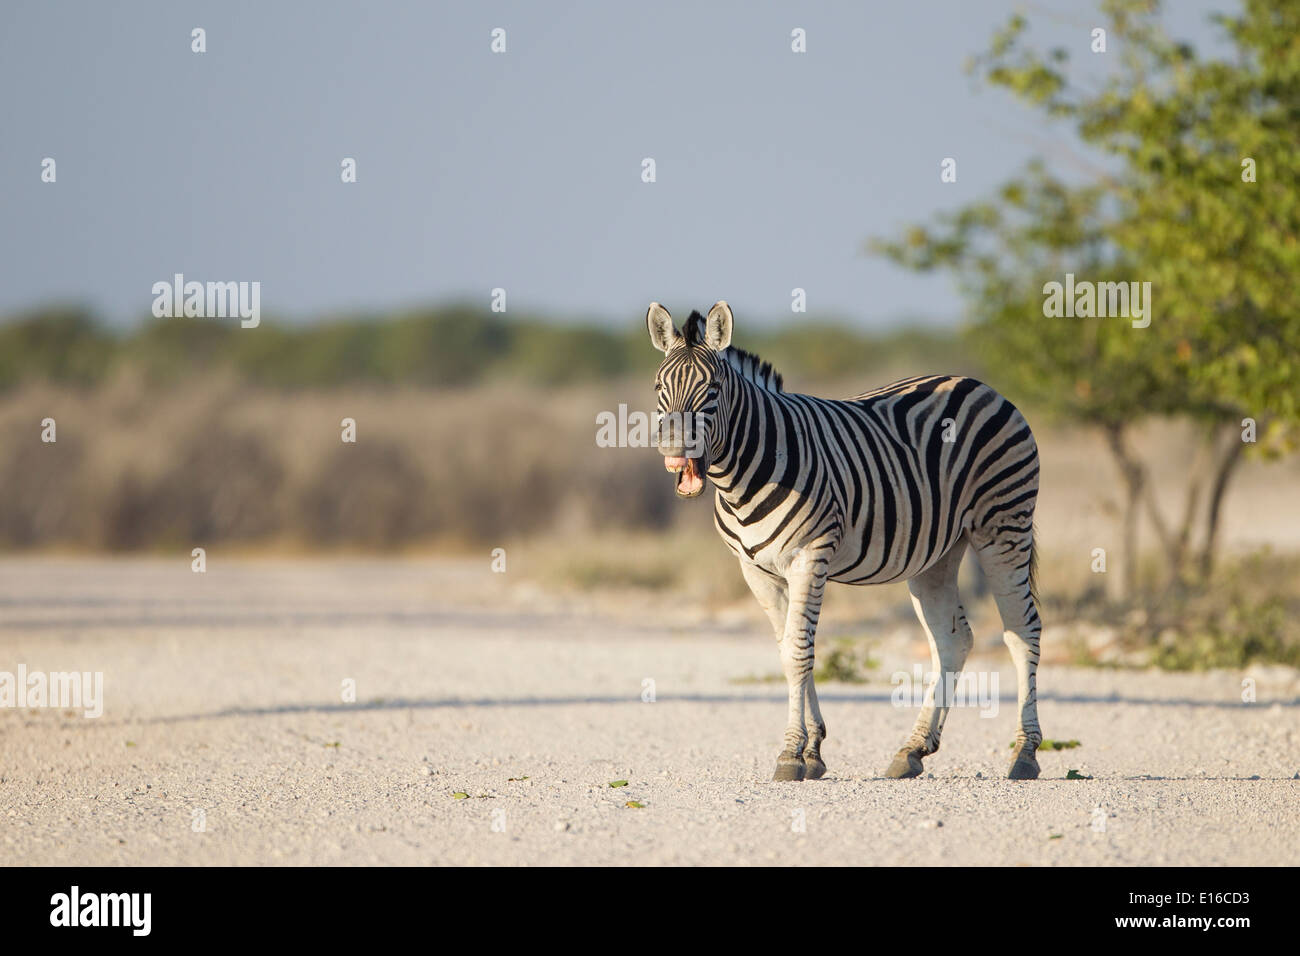 Zèbre en Afrique Photo Stock